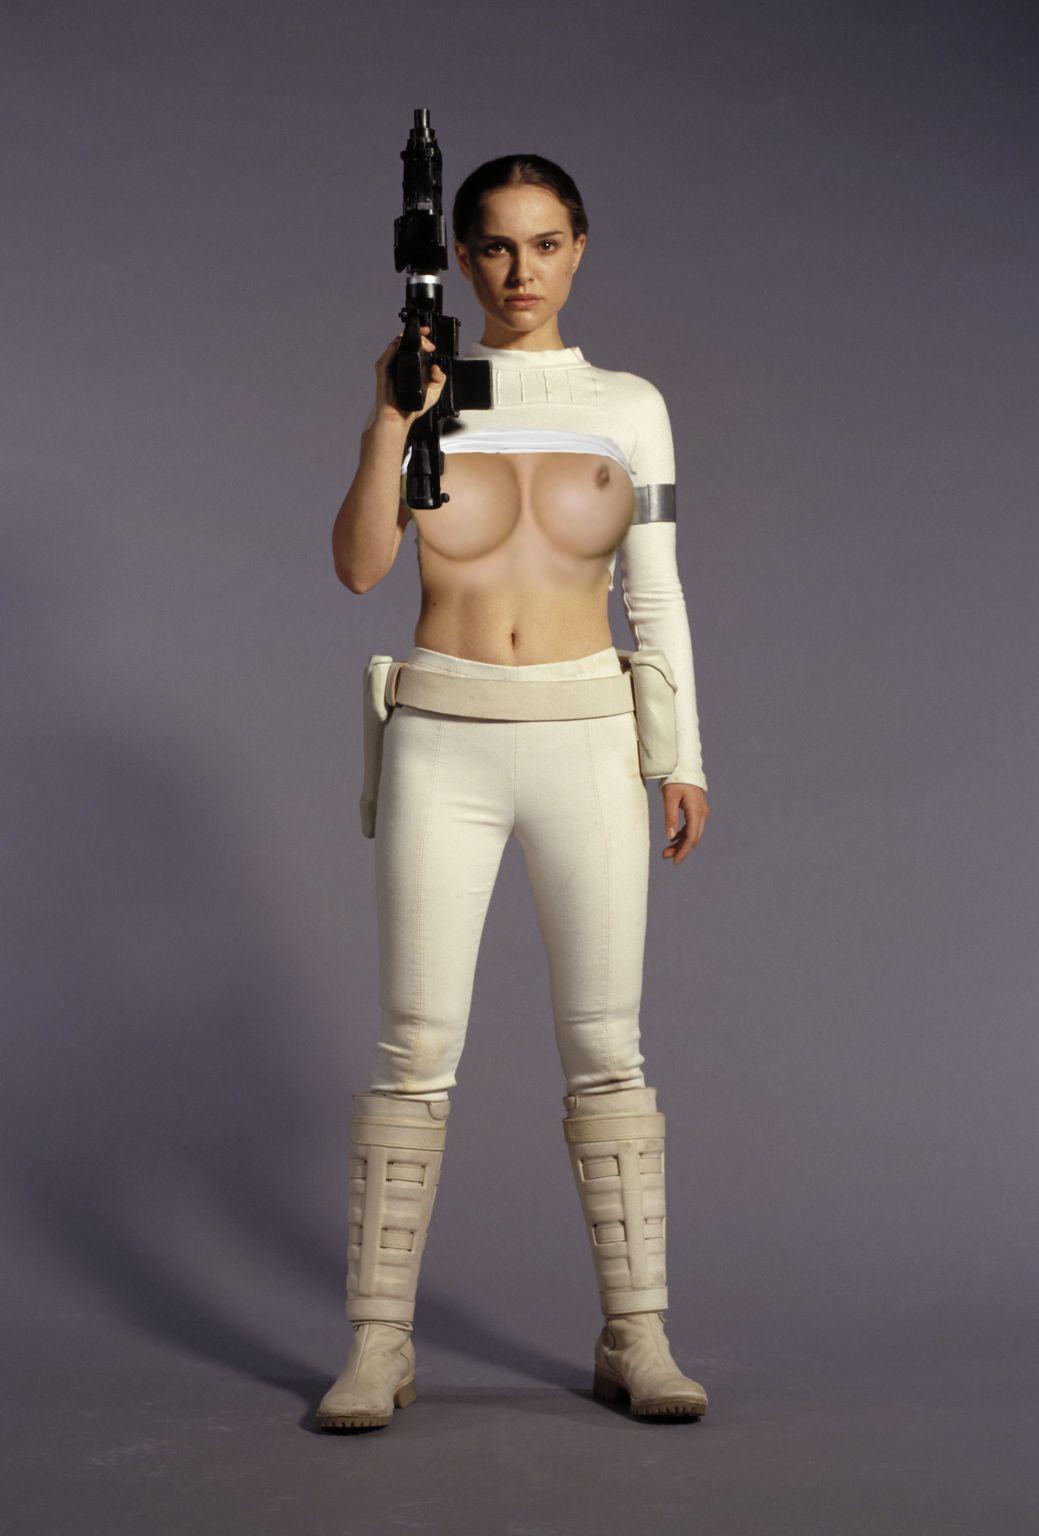 Star Wars: The Clone Wars srie tlvise danimation